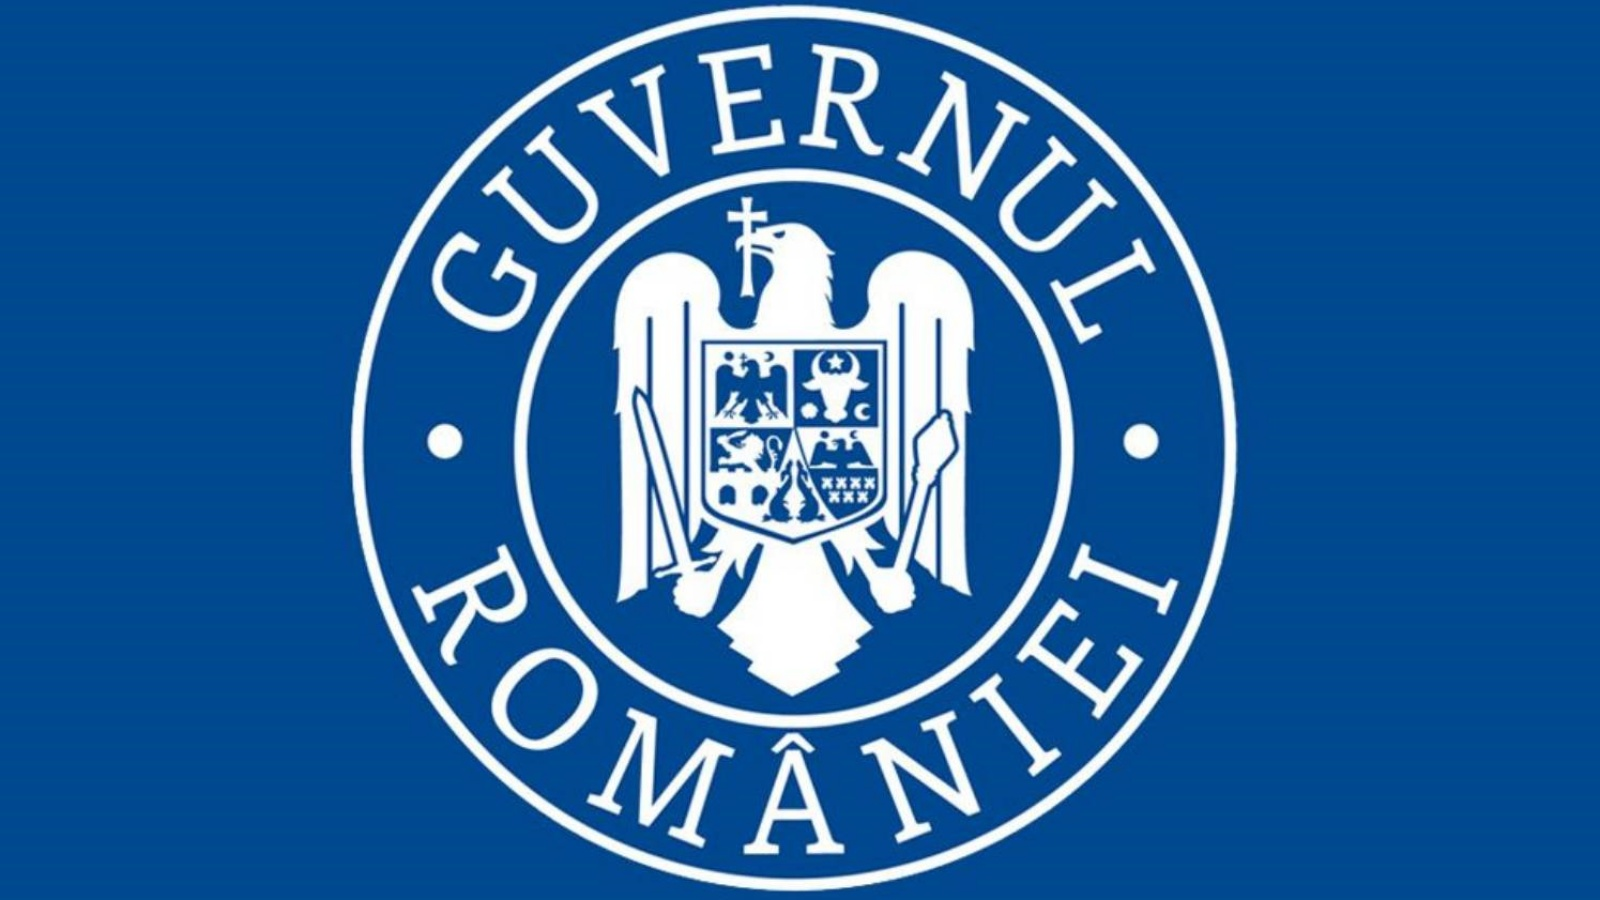 Guvernul Romaniei Atentionare Cibernetica Retelele Sociale